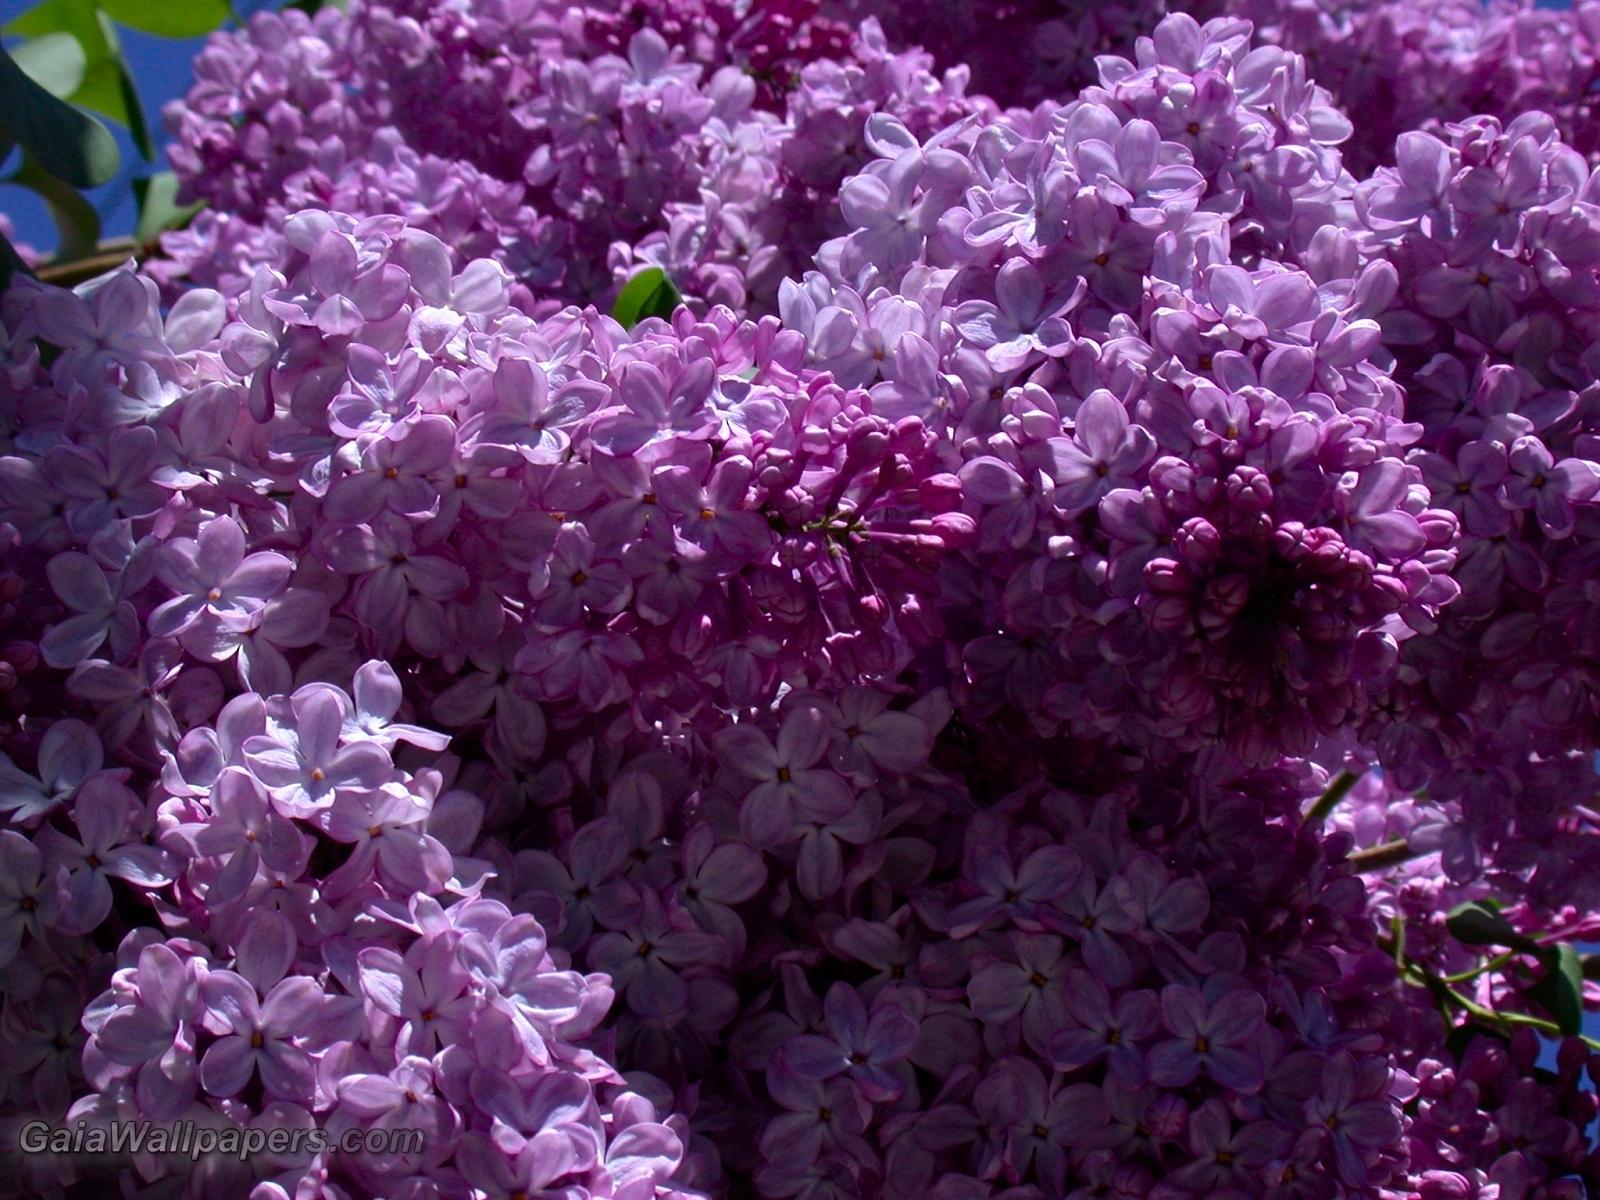 Lilac wallpapers 1600x1200   Desktop Wallpapers 200402191 1600x1200